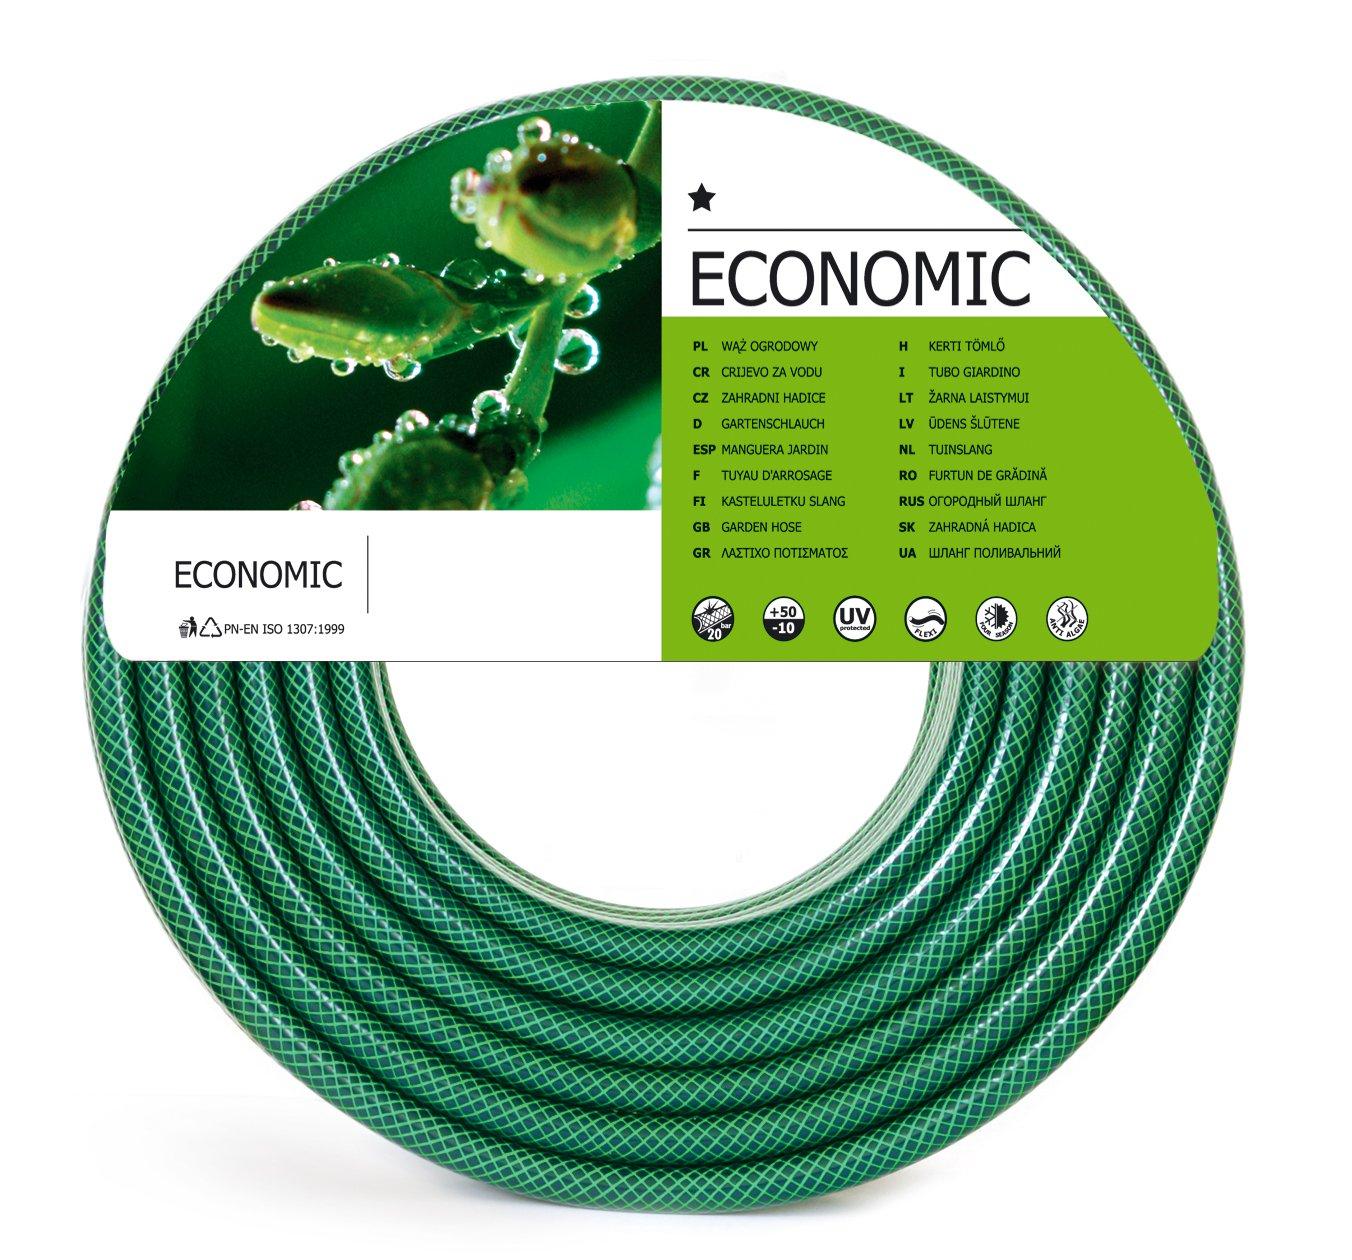 Cellfast ECONOMIC Garden Hose now £4.13 add-on item at Amazon